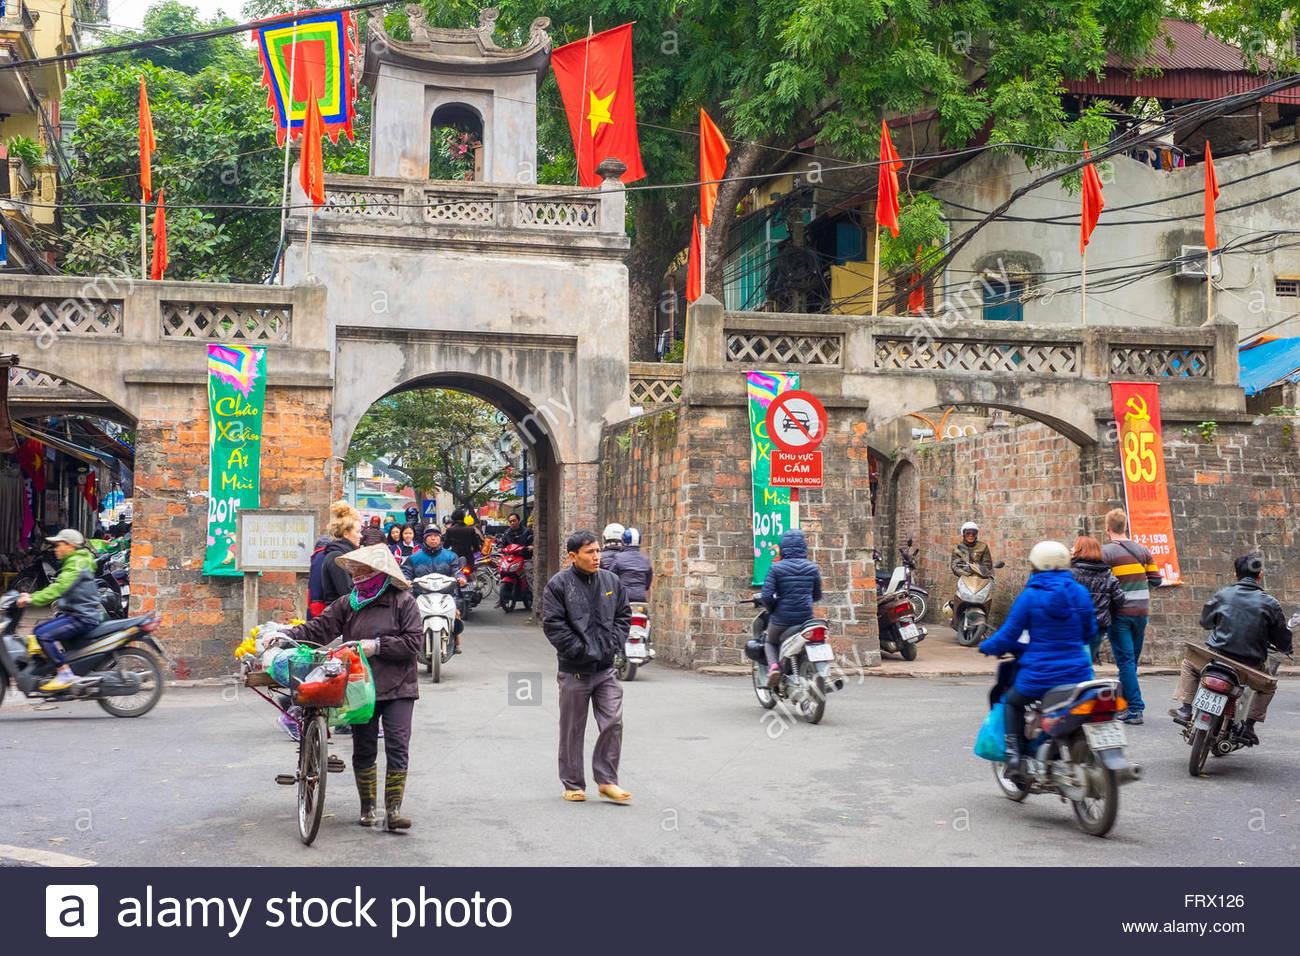 Quan Chuong Gate, old city gate, Hoan Kiem District, Old Quarter, Hanoi, Vietnam - Stock Image